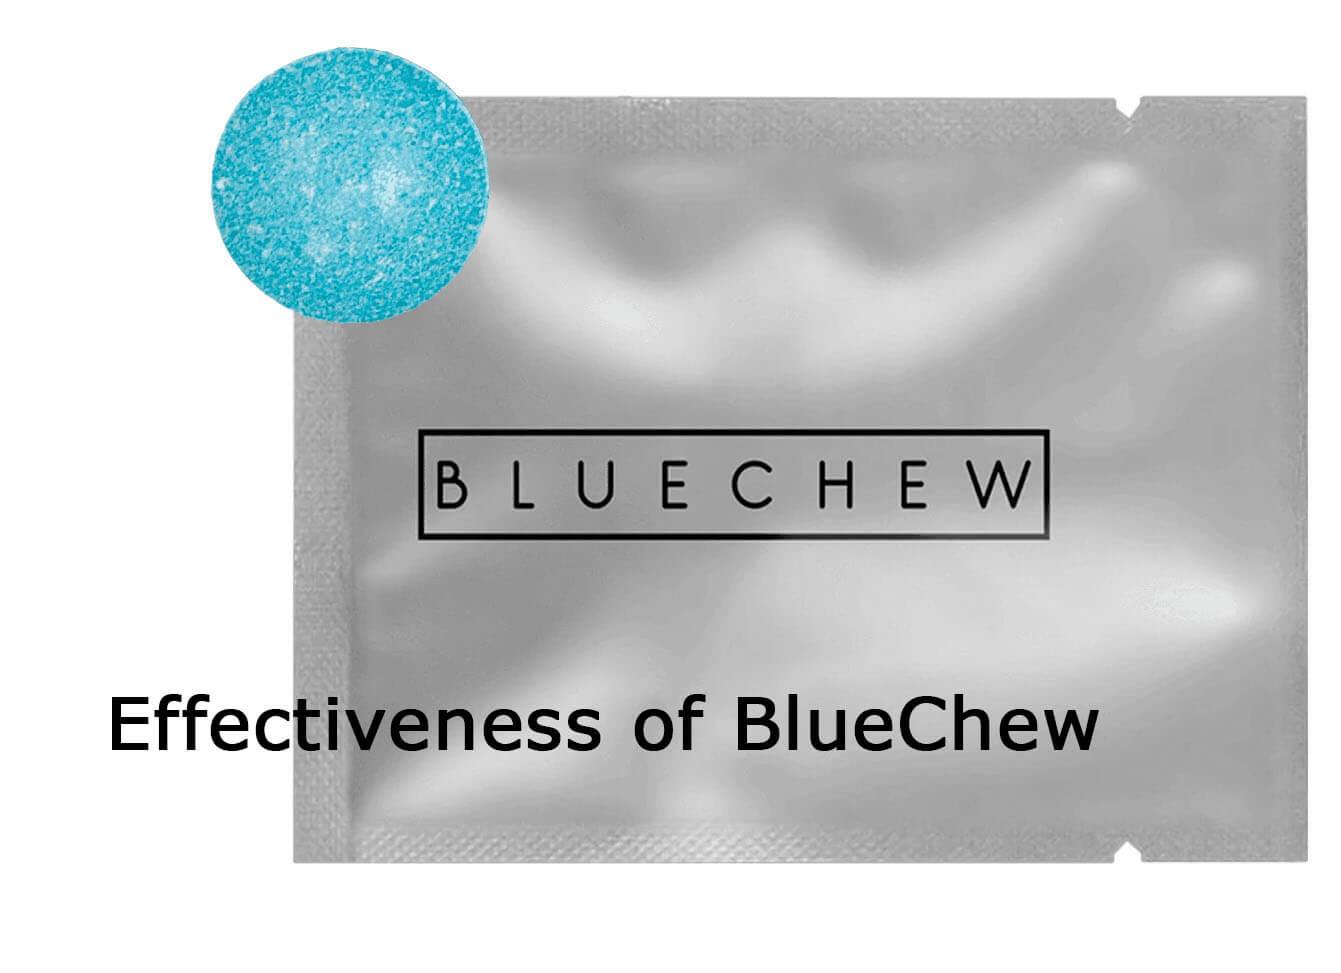 effectiveness of bluechew